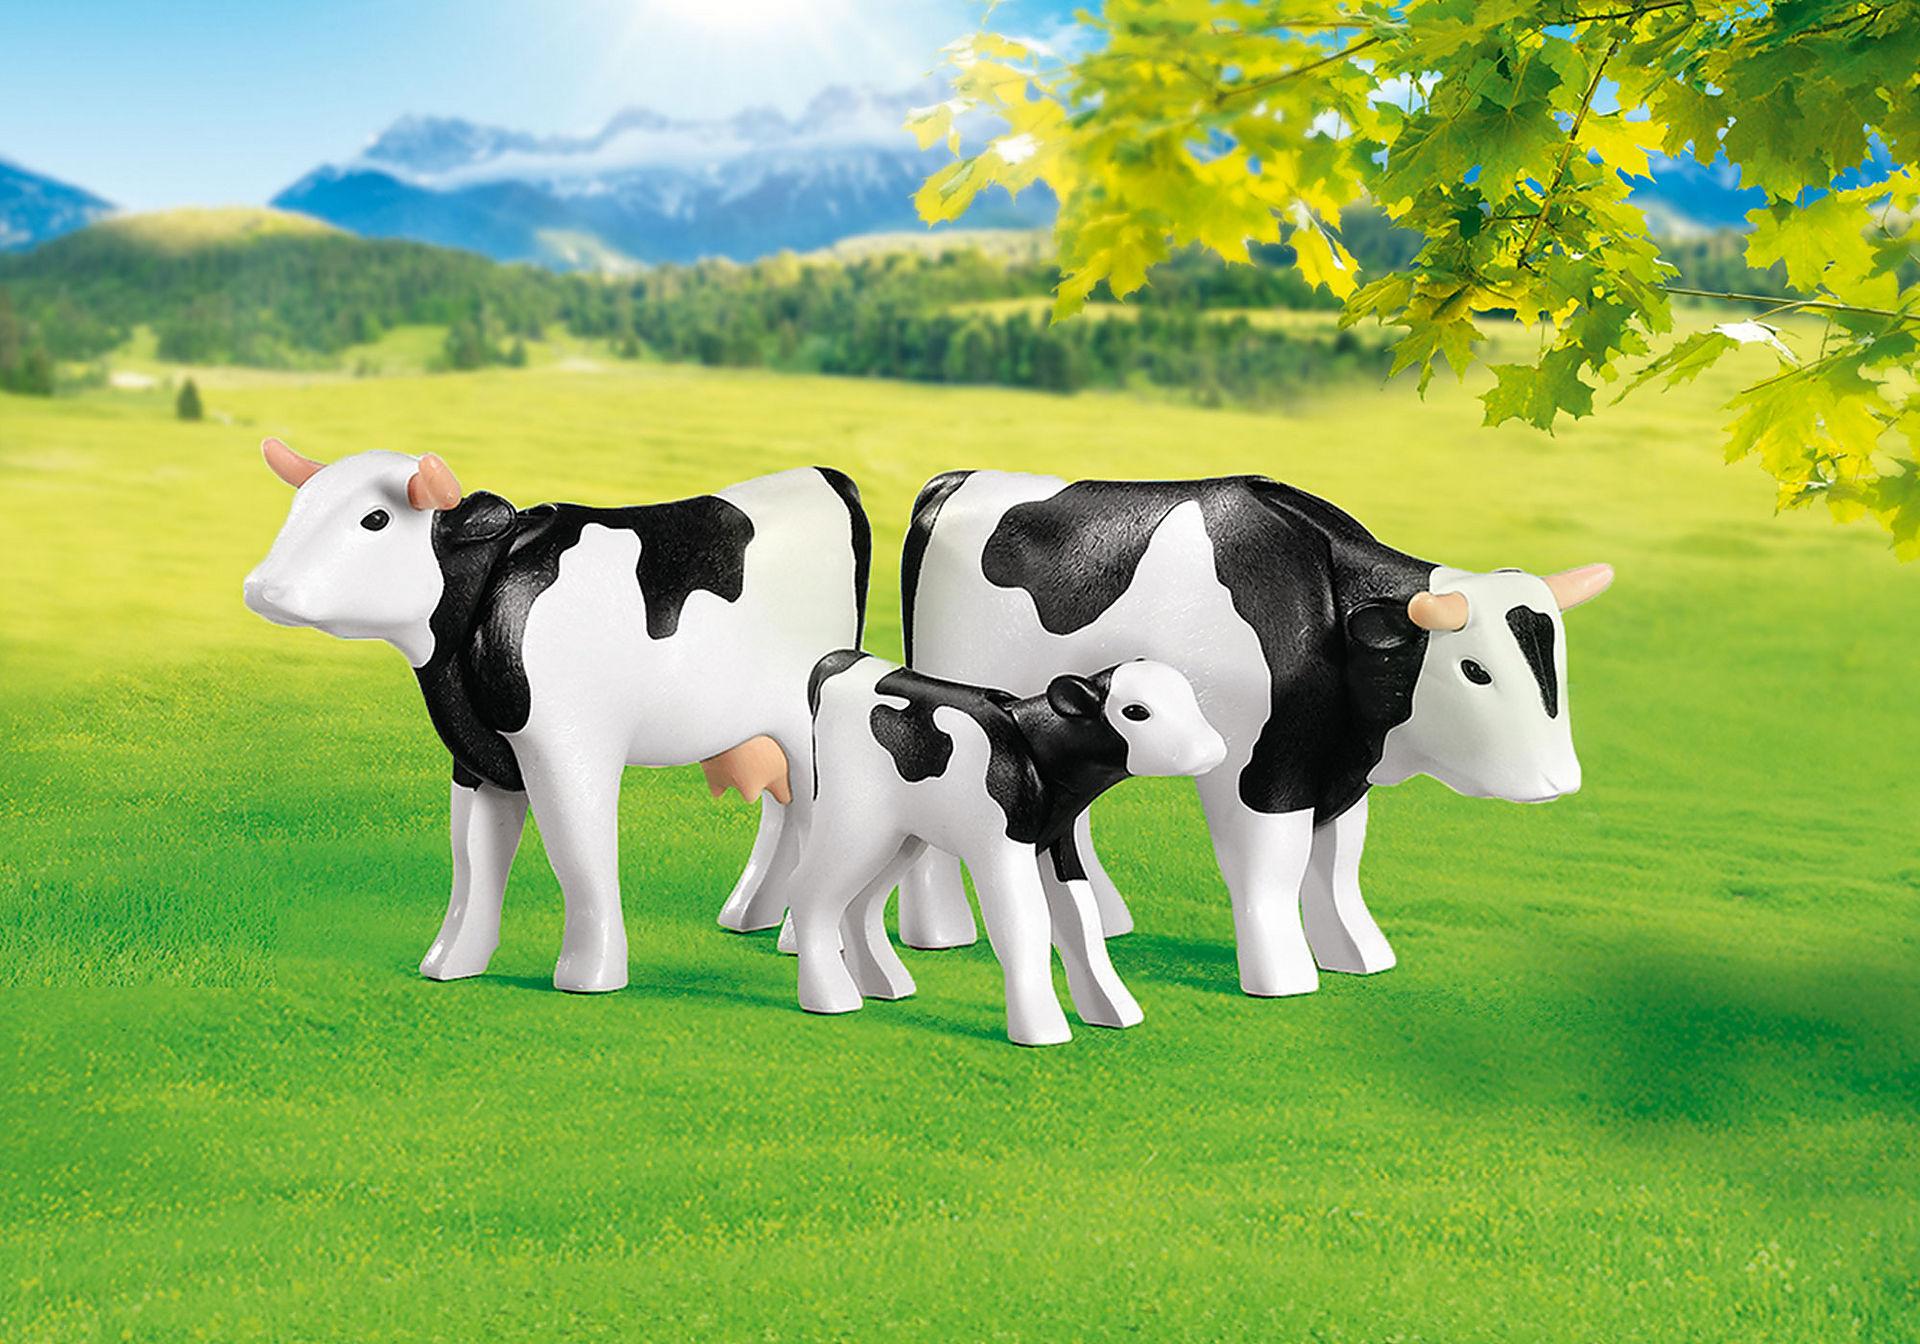 7892 2 Vacas com bezerro zoom image1